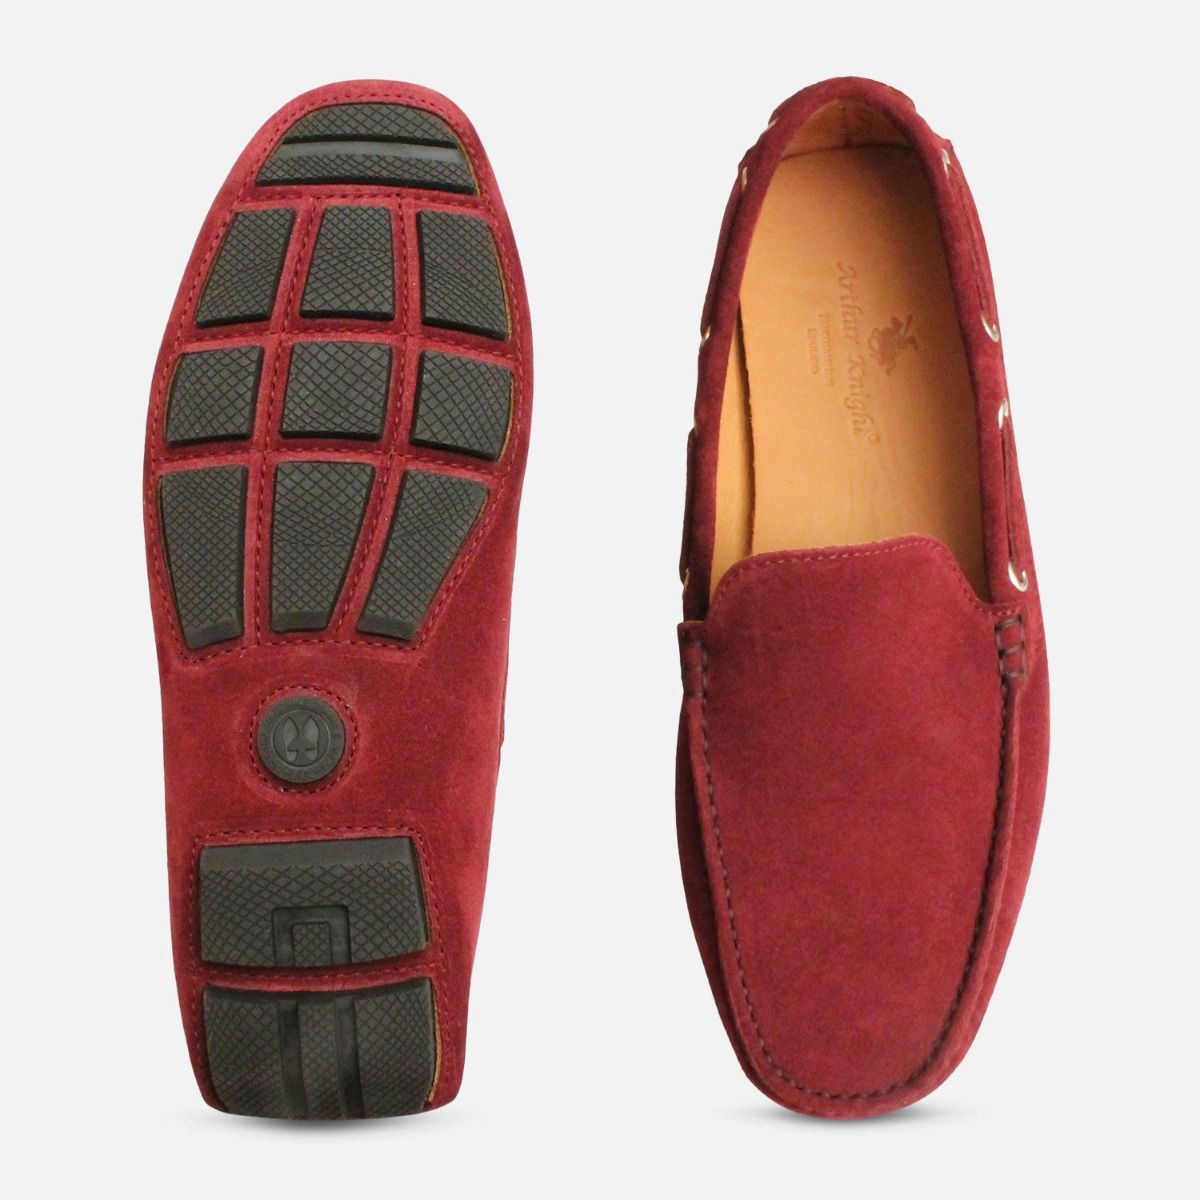 Aubergine Velour Suede Driving Shoe Moccasins